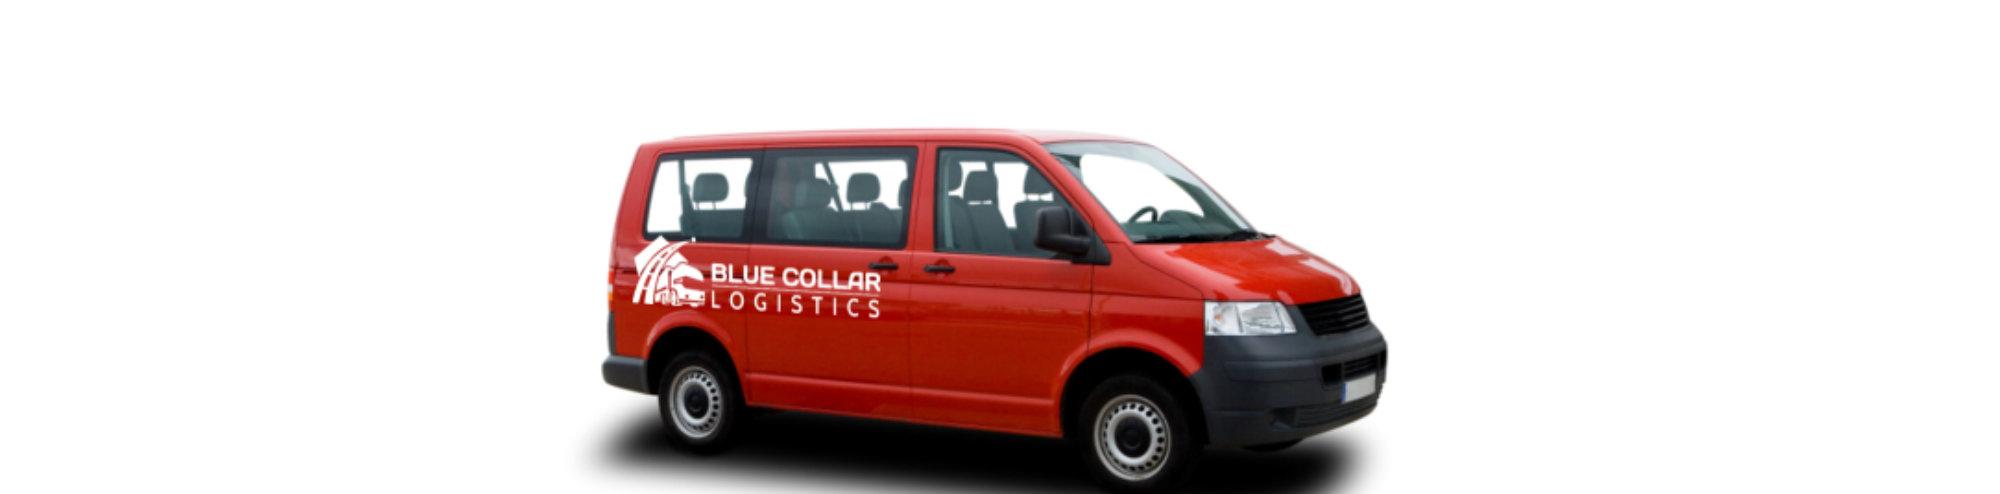 Passenger red Vans